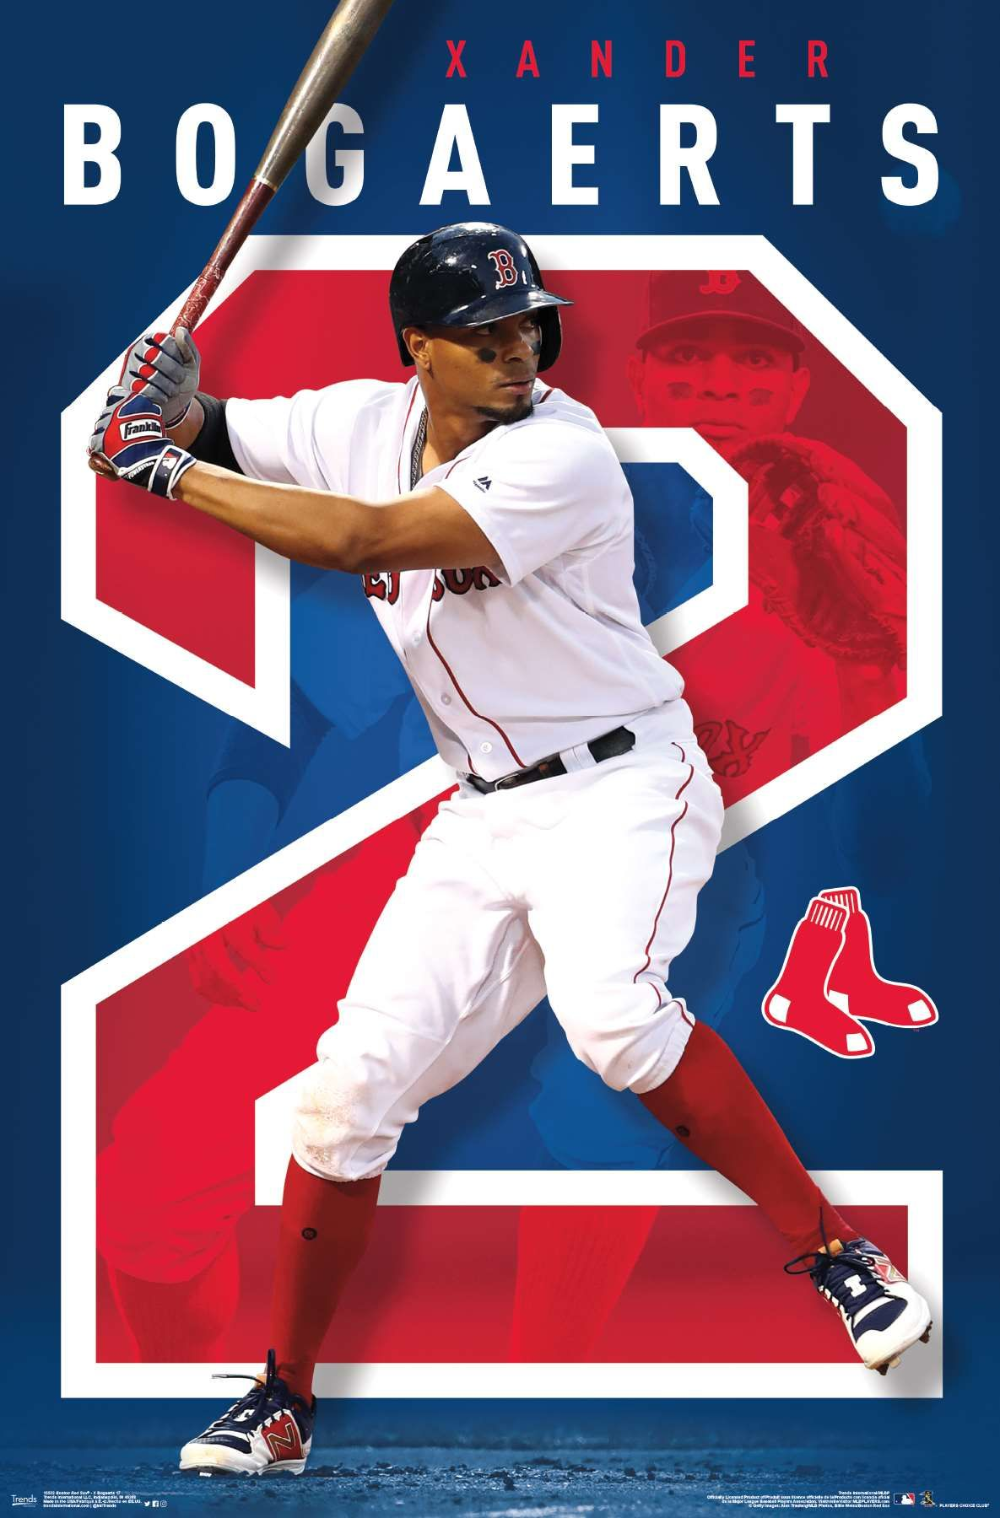 Mlb Boston Red Sox Xander Bogaerts In 2020 Red Sox Boston Red Sox Mlb